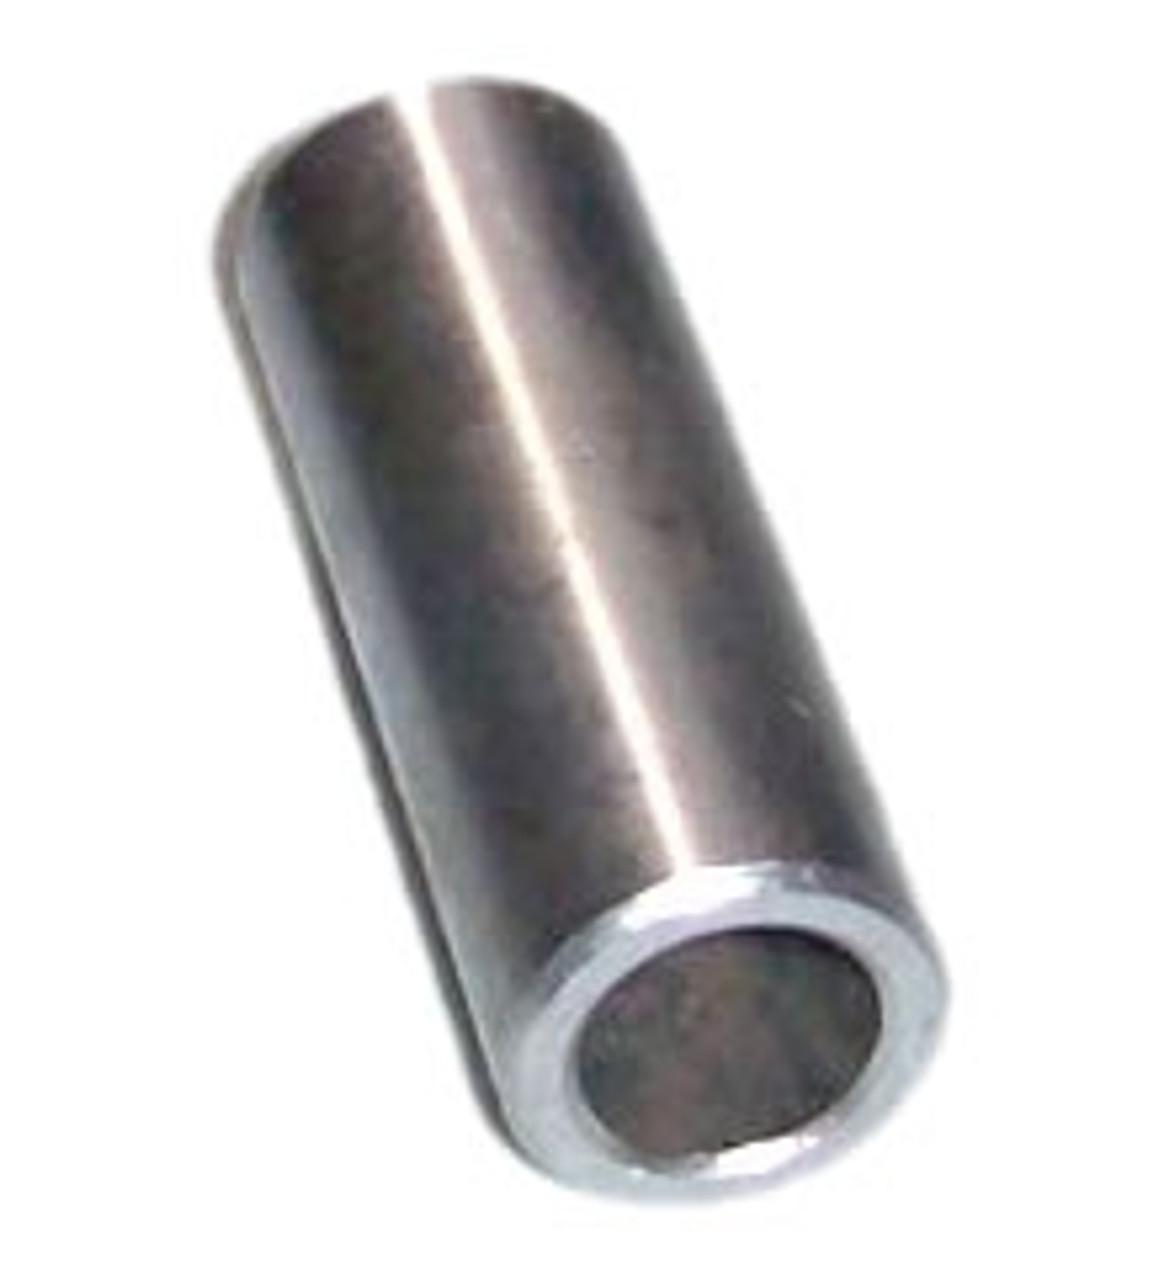 M150-1004006 / 513-1036